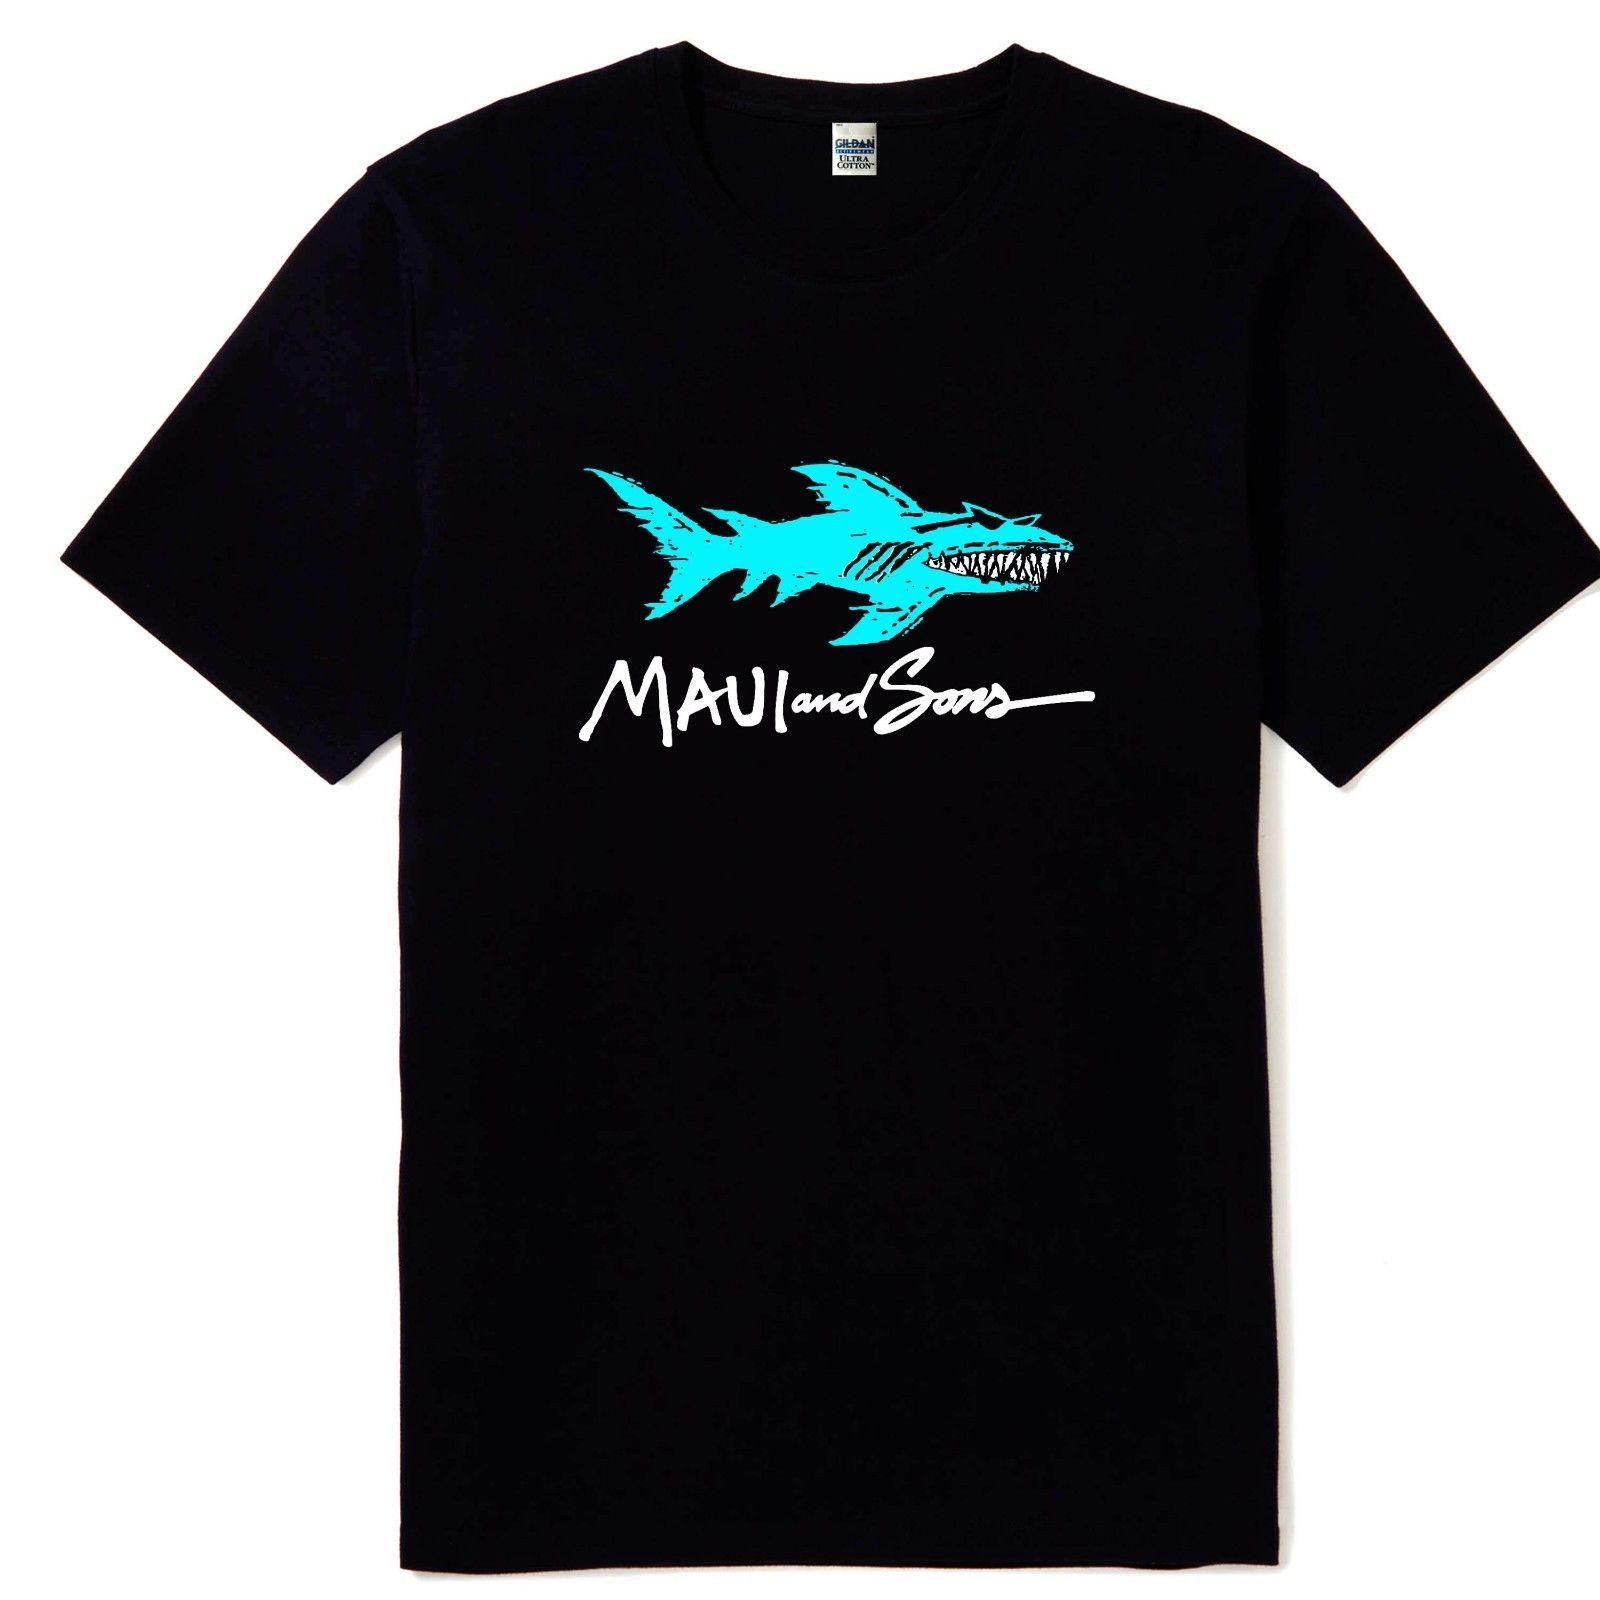 0c20789cd Compre Nuevo Maui And Sons Shark Logo Hombre Color Negro Camiseta Tallas S  M L XL 2XL Reimpresión A $11.58 Del Cheaptshirts48 | DHgate.Com